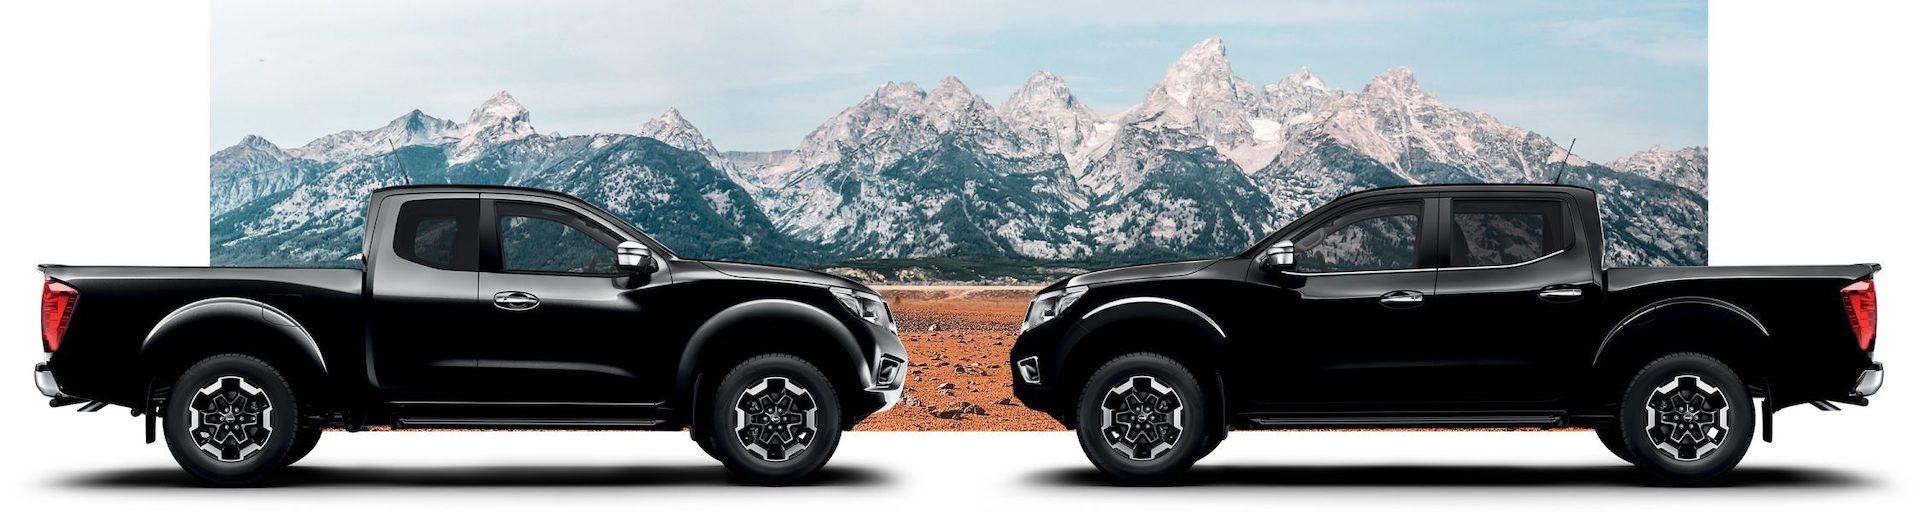 Nissan Navara King Cab e Cabine Dupla